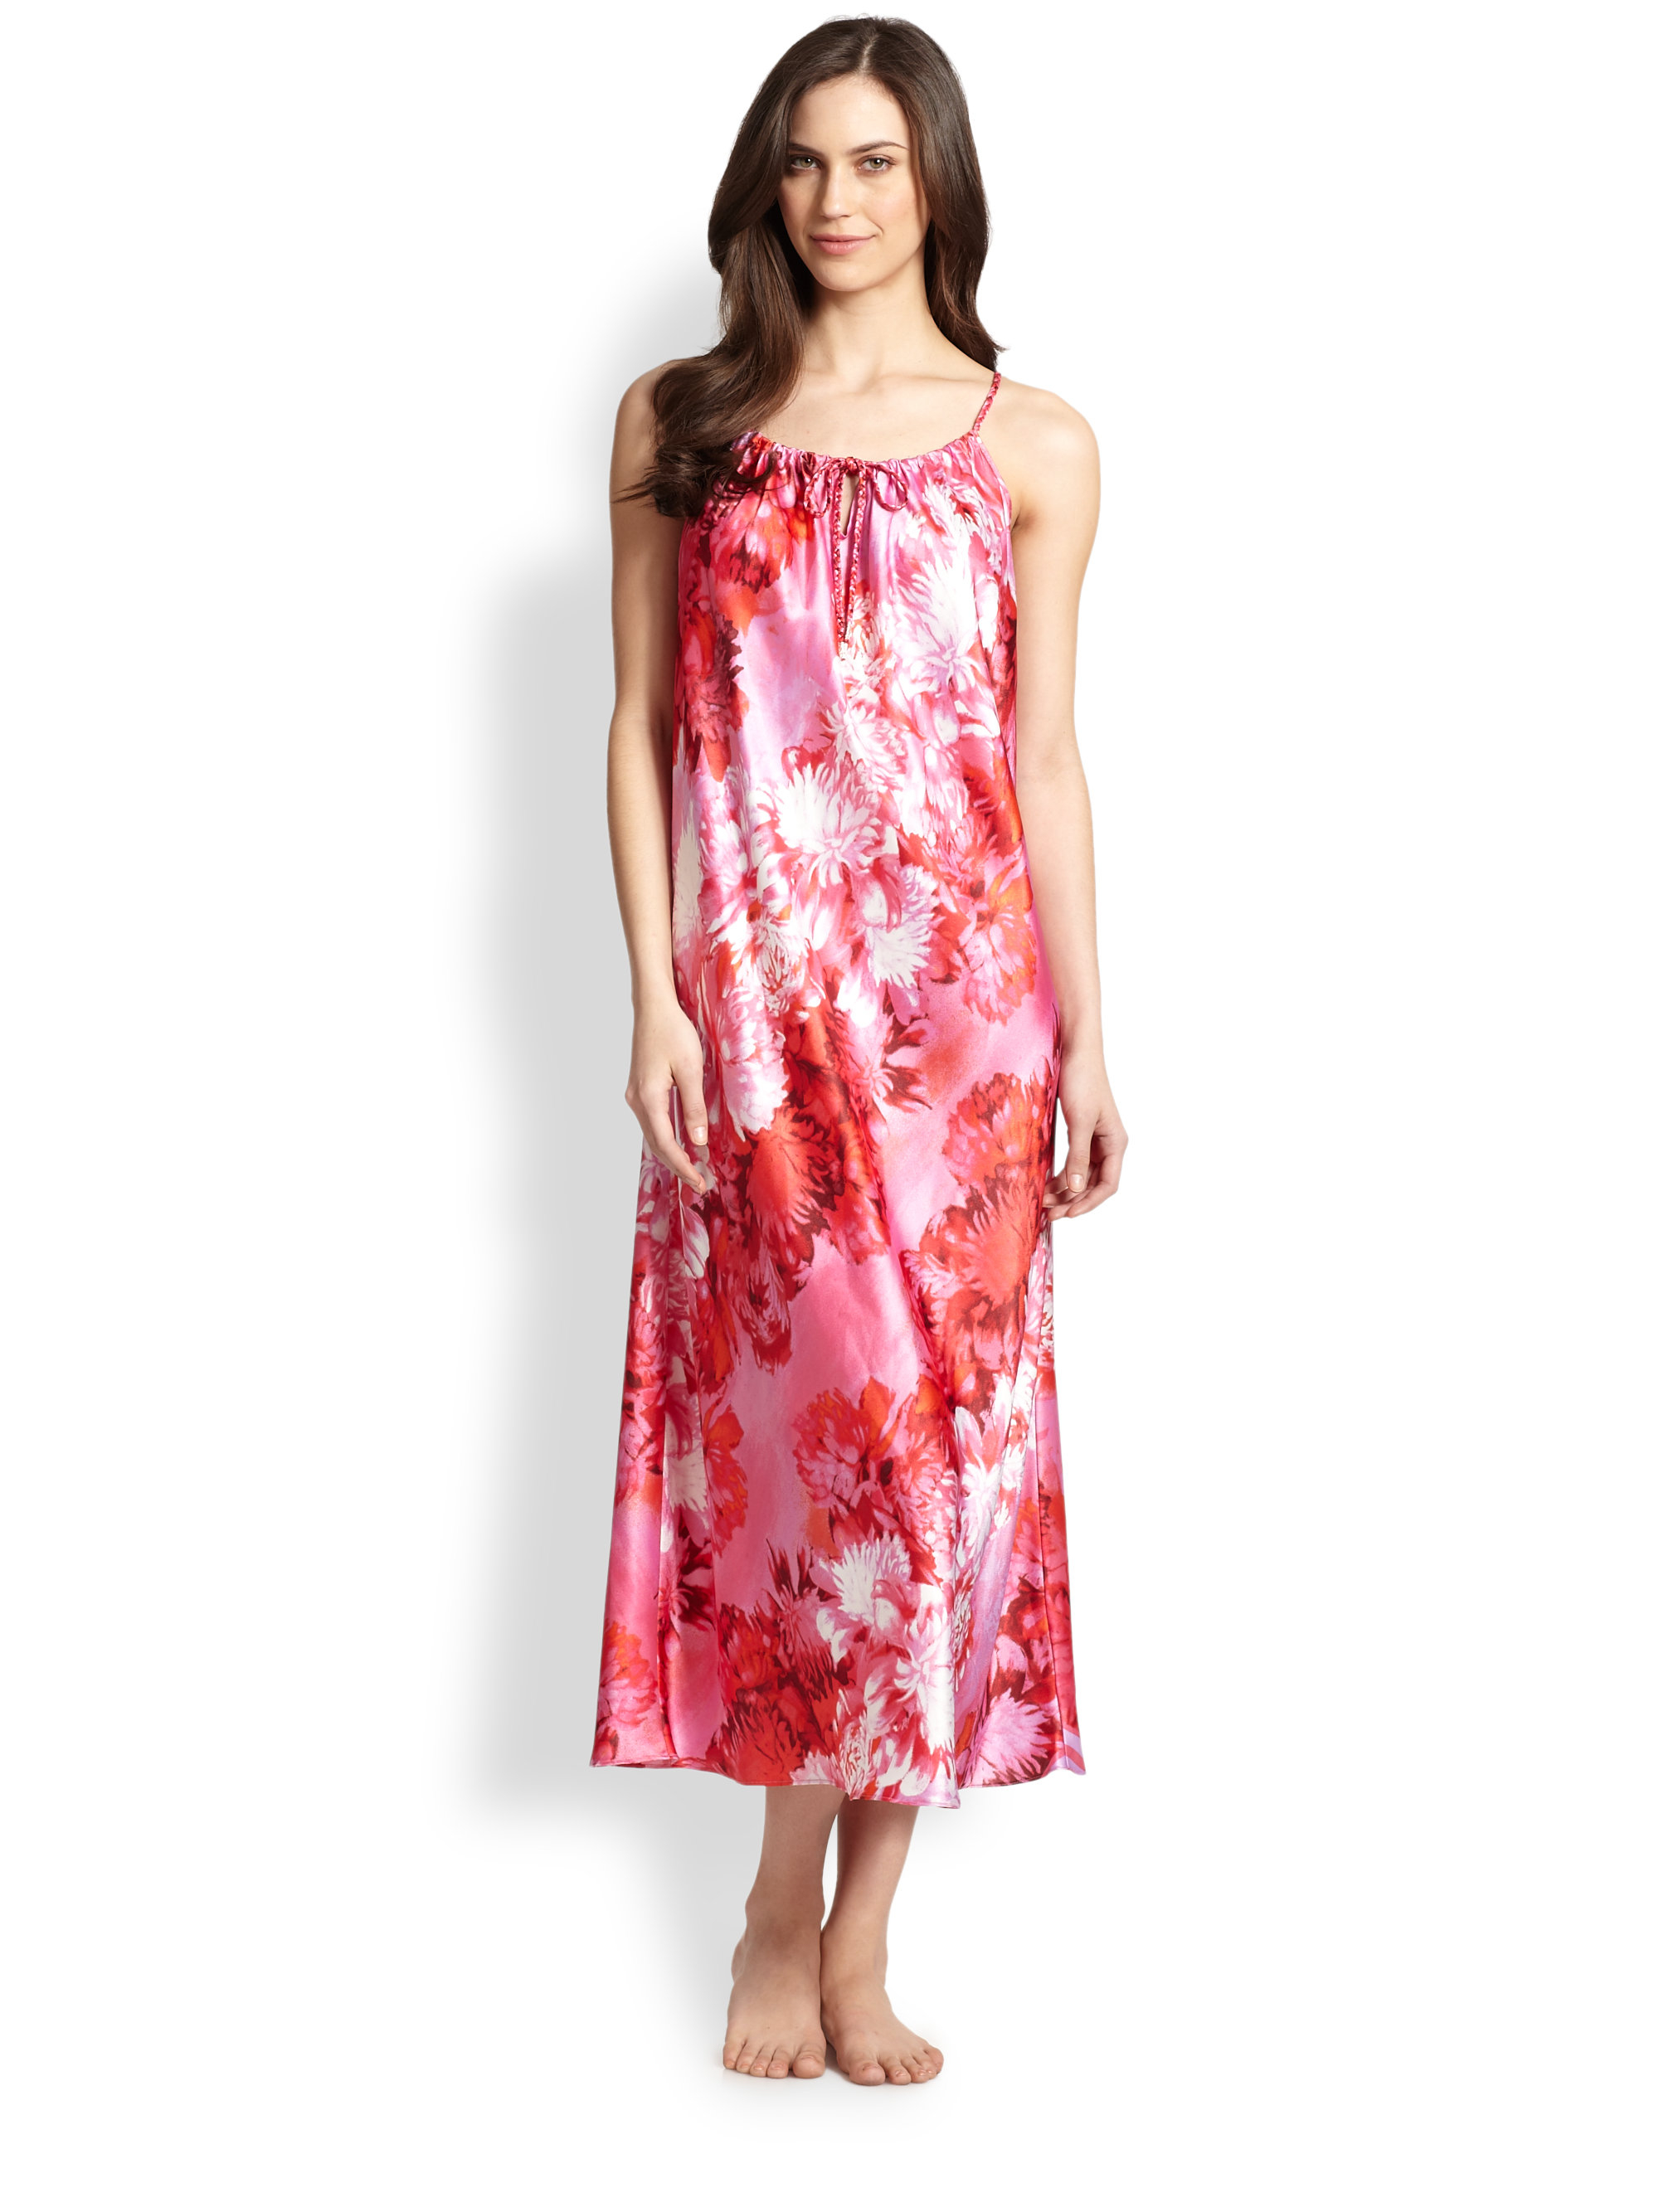 Lyst - Oscar De La Renta Floral-Print Polyester Satin Nightgown in Red